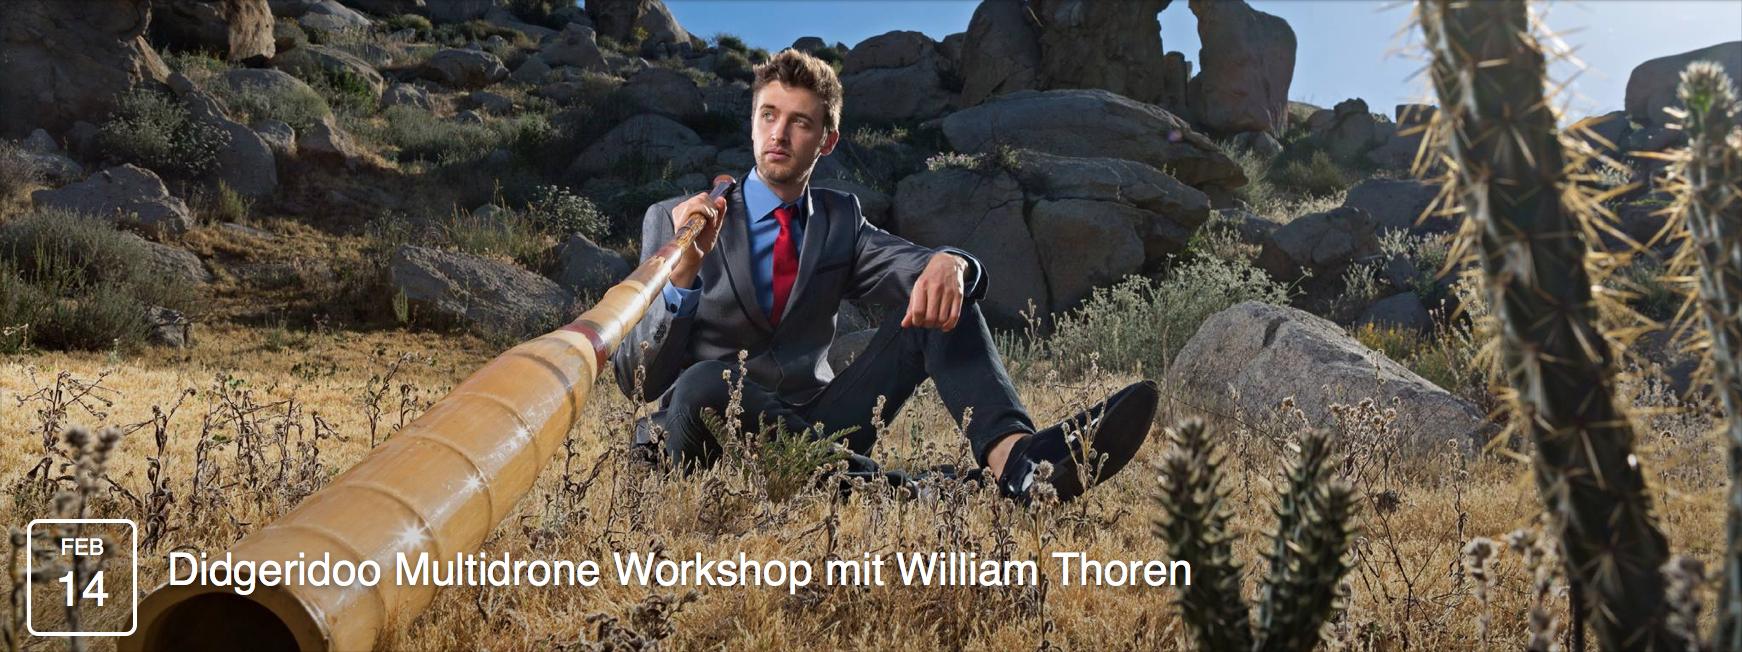 william thoren workshop germany